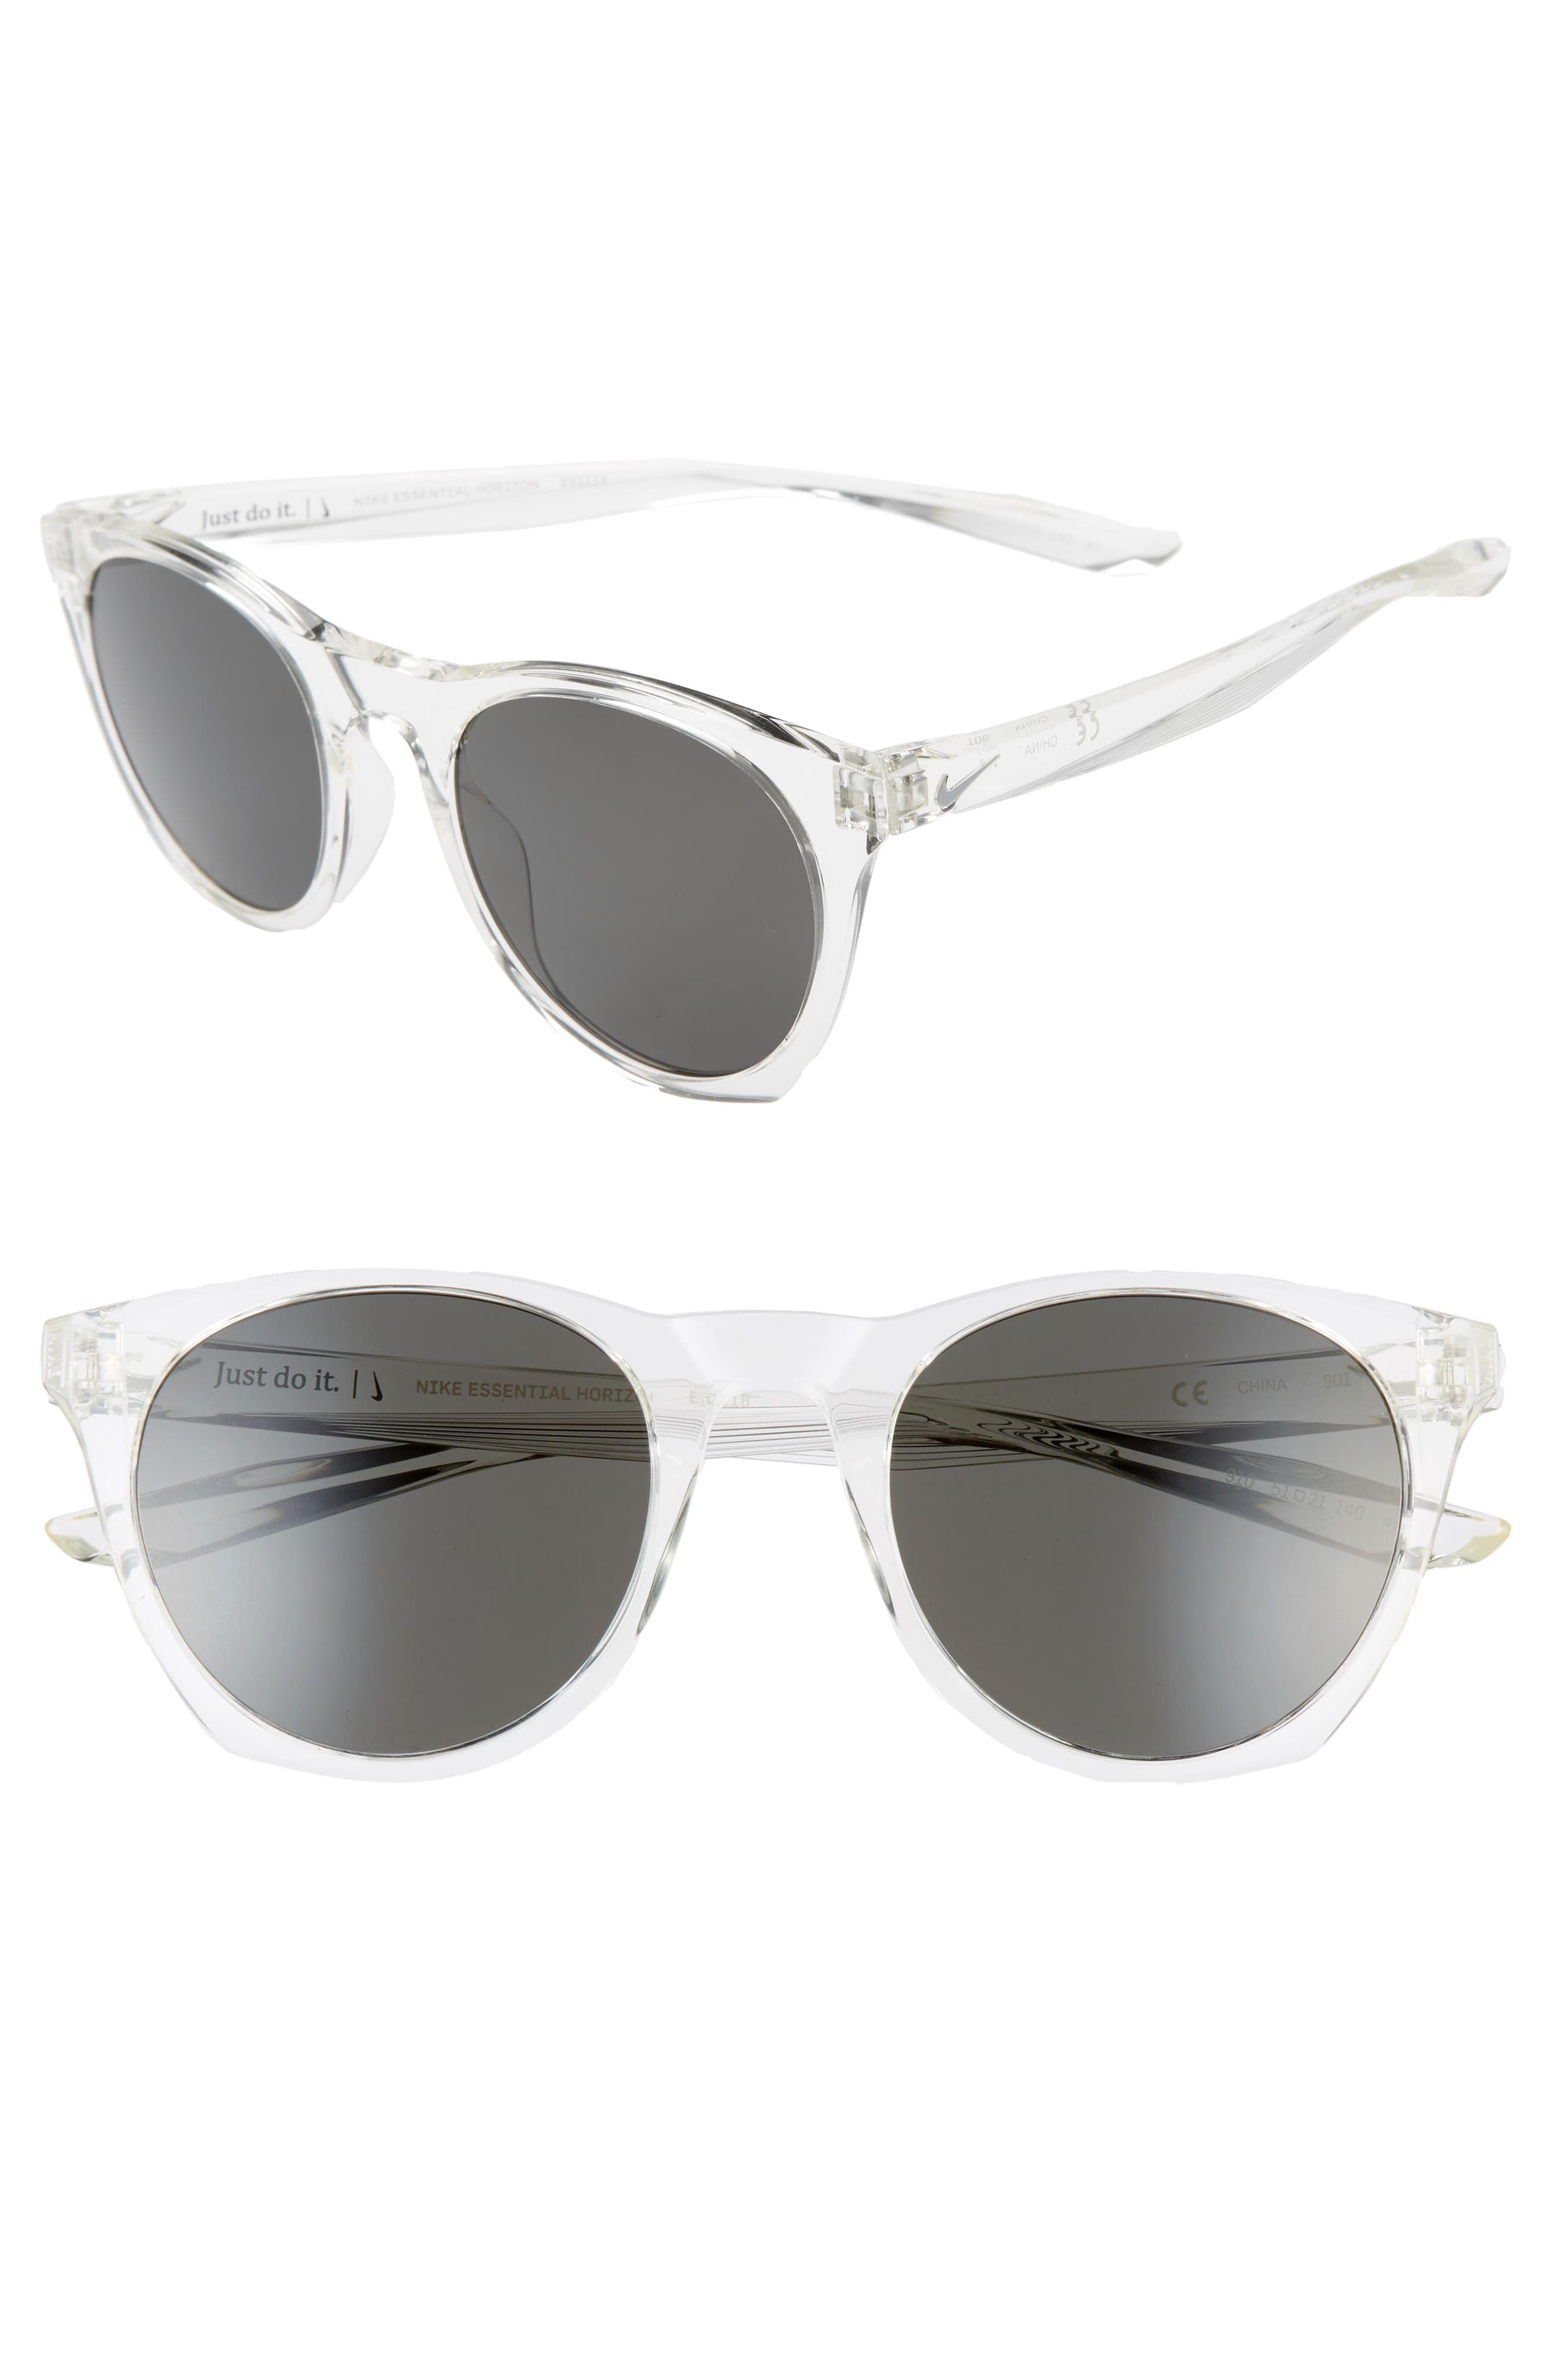 Nike Essential Horizon 51Mm Sunglasses Clear/ Dark Grey